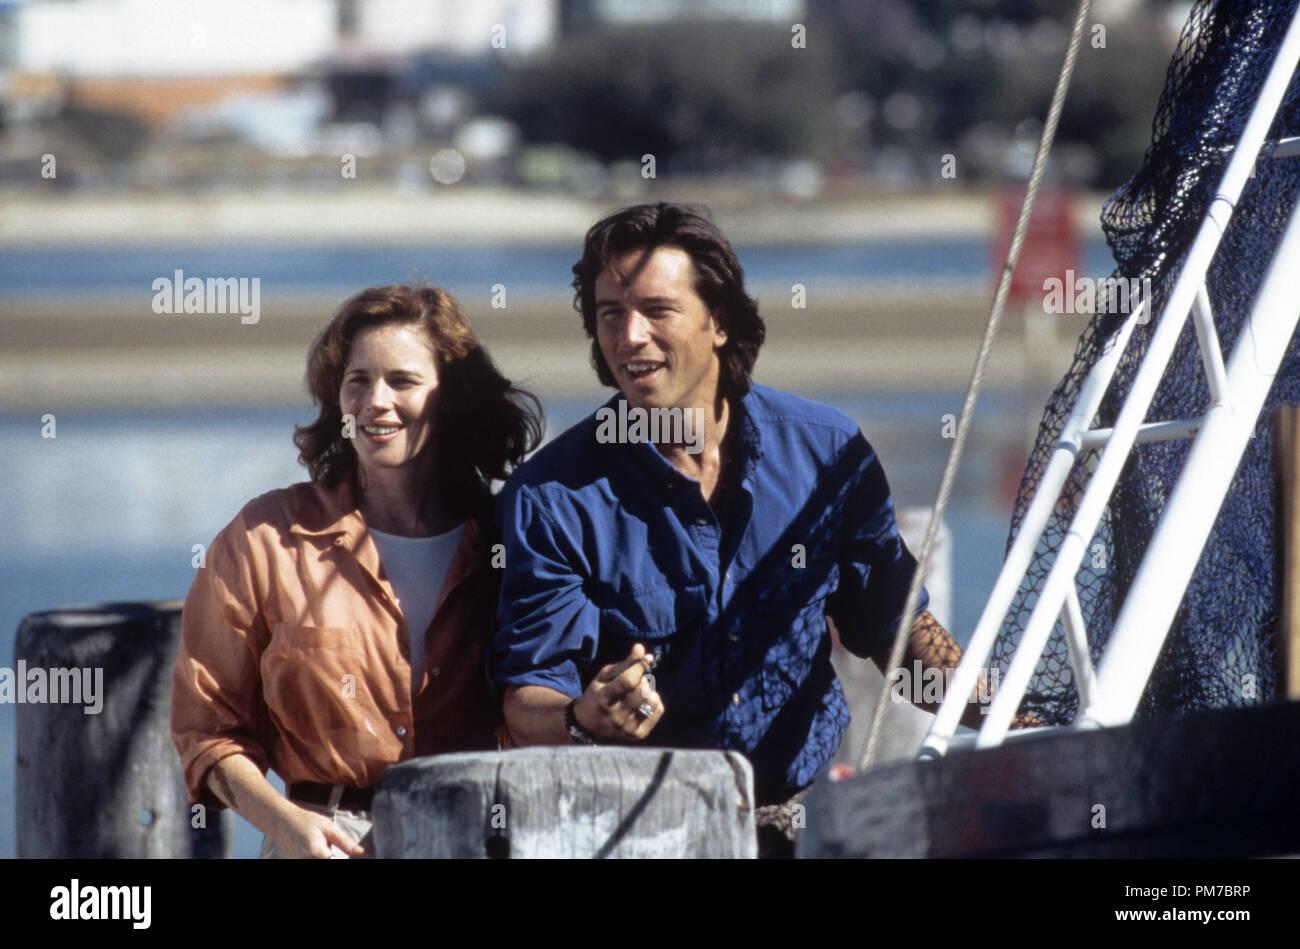 Sahar Valadbeigi,Julian Holloway (born 1944) XXX movies Janet Mahoney,Harry Lloyd (born 1983)